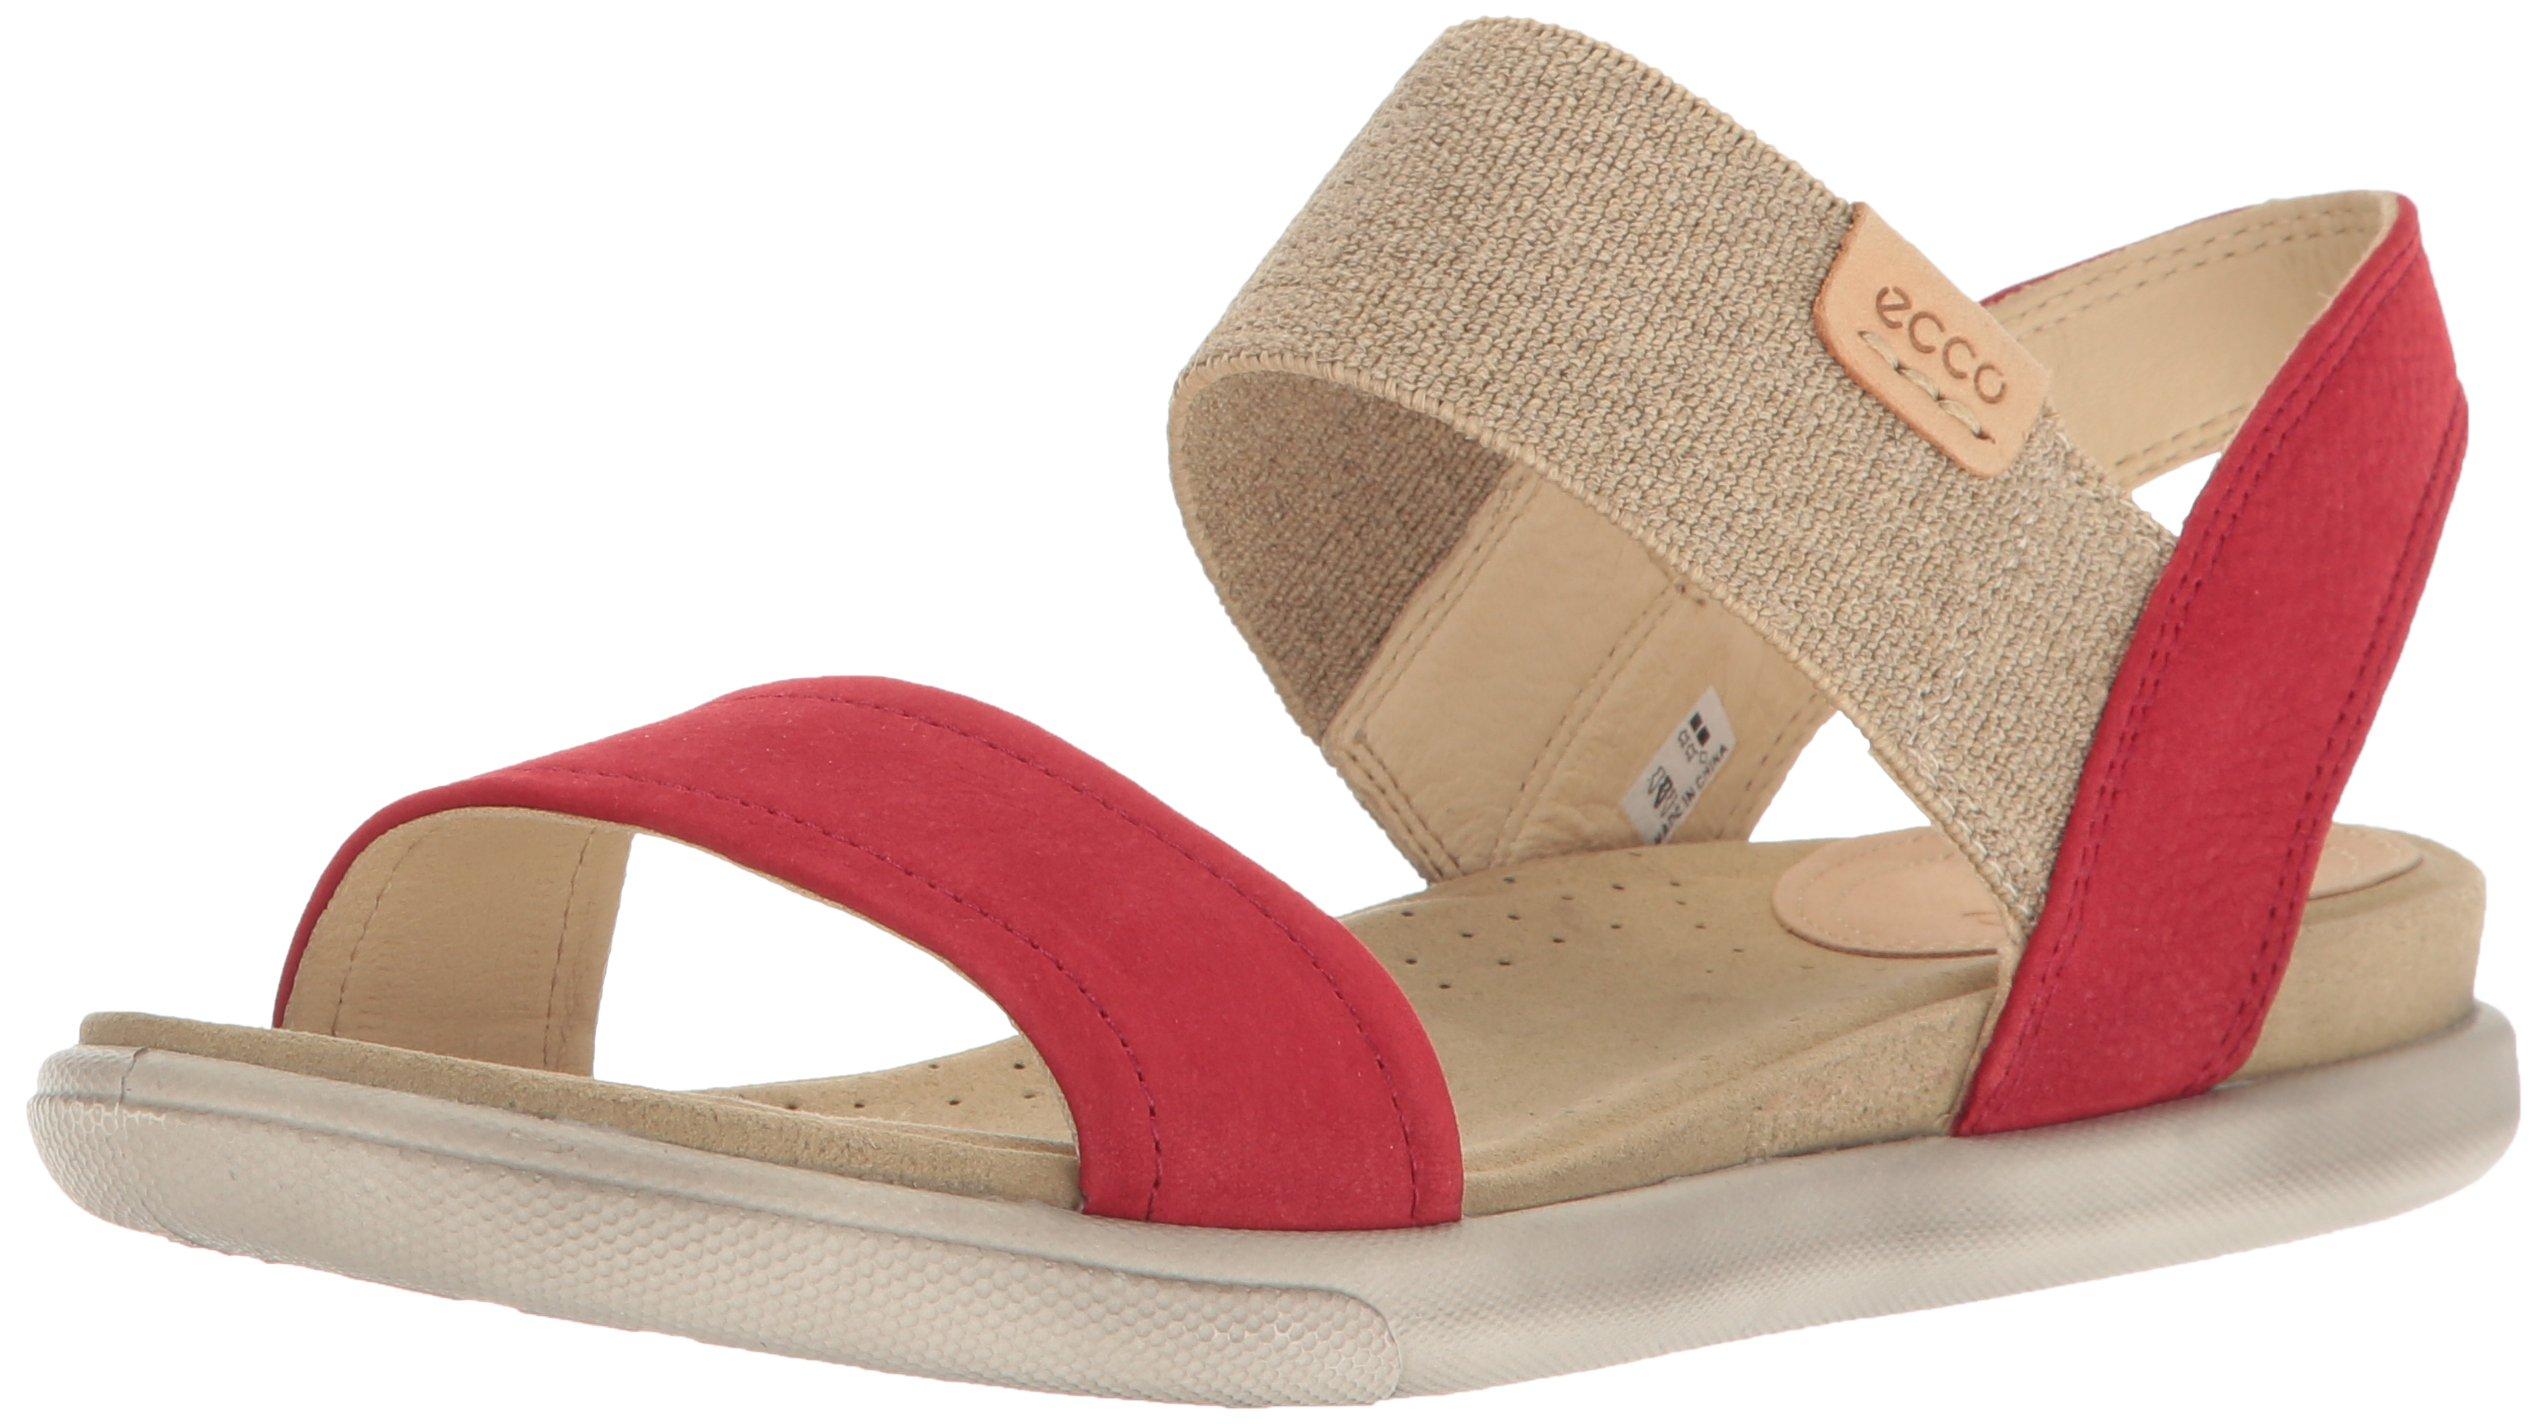 ECCO Women's Women's Damara Ankle Gladiator Sandal, Chili Red/Powder, 37 EU/6-6.5 US